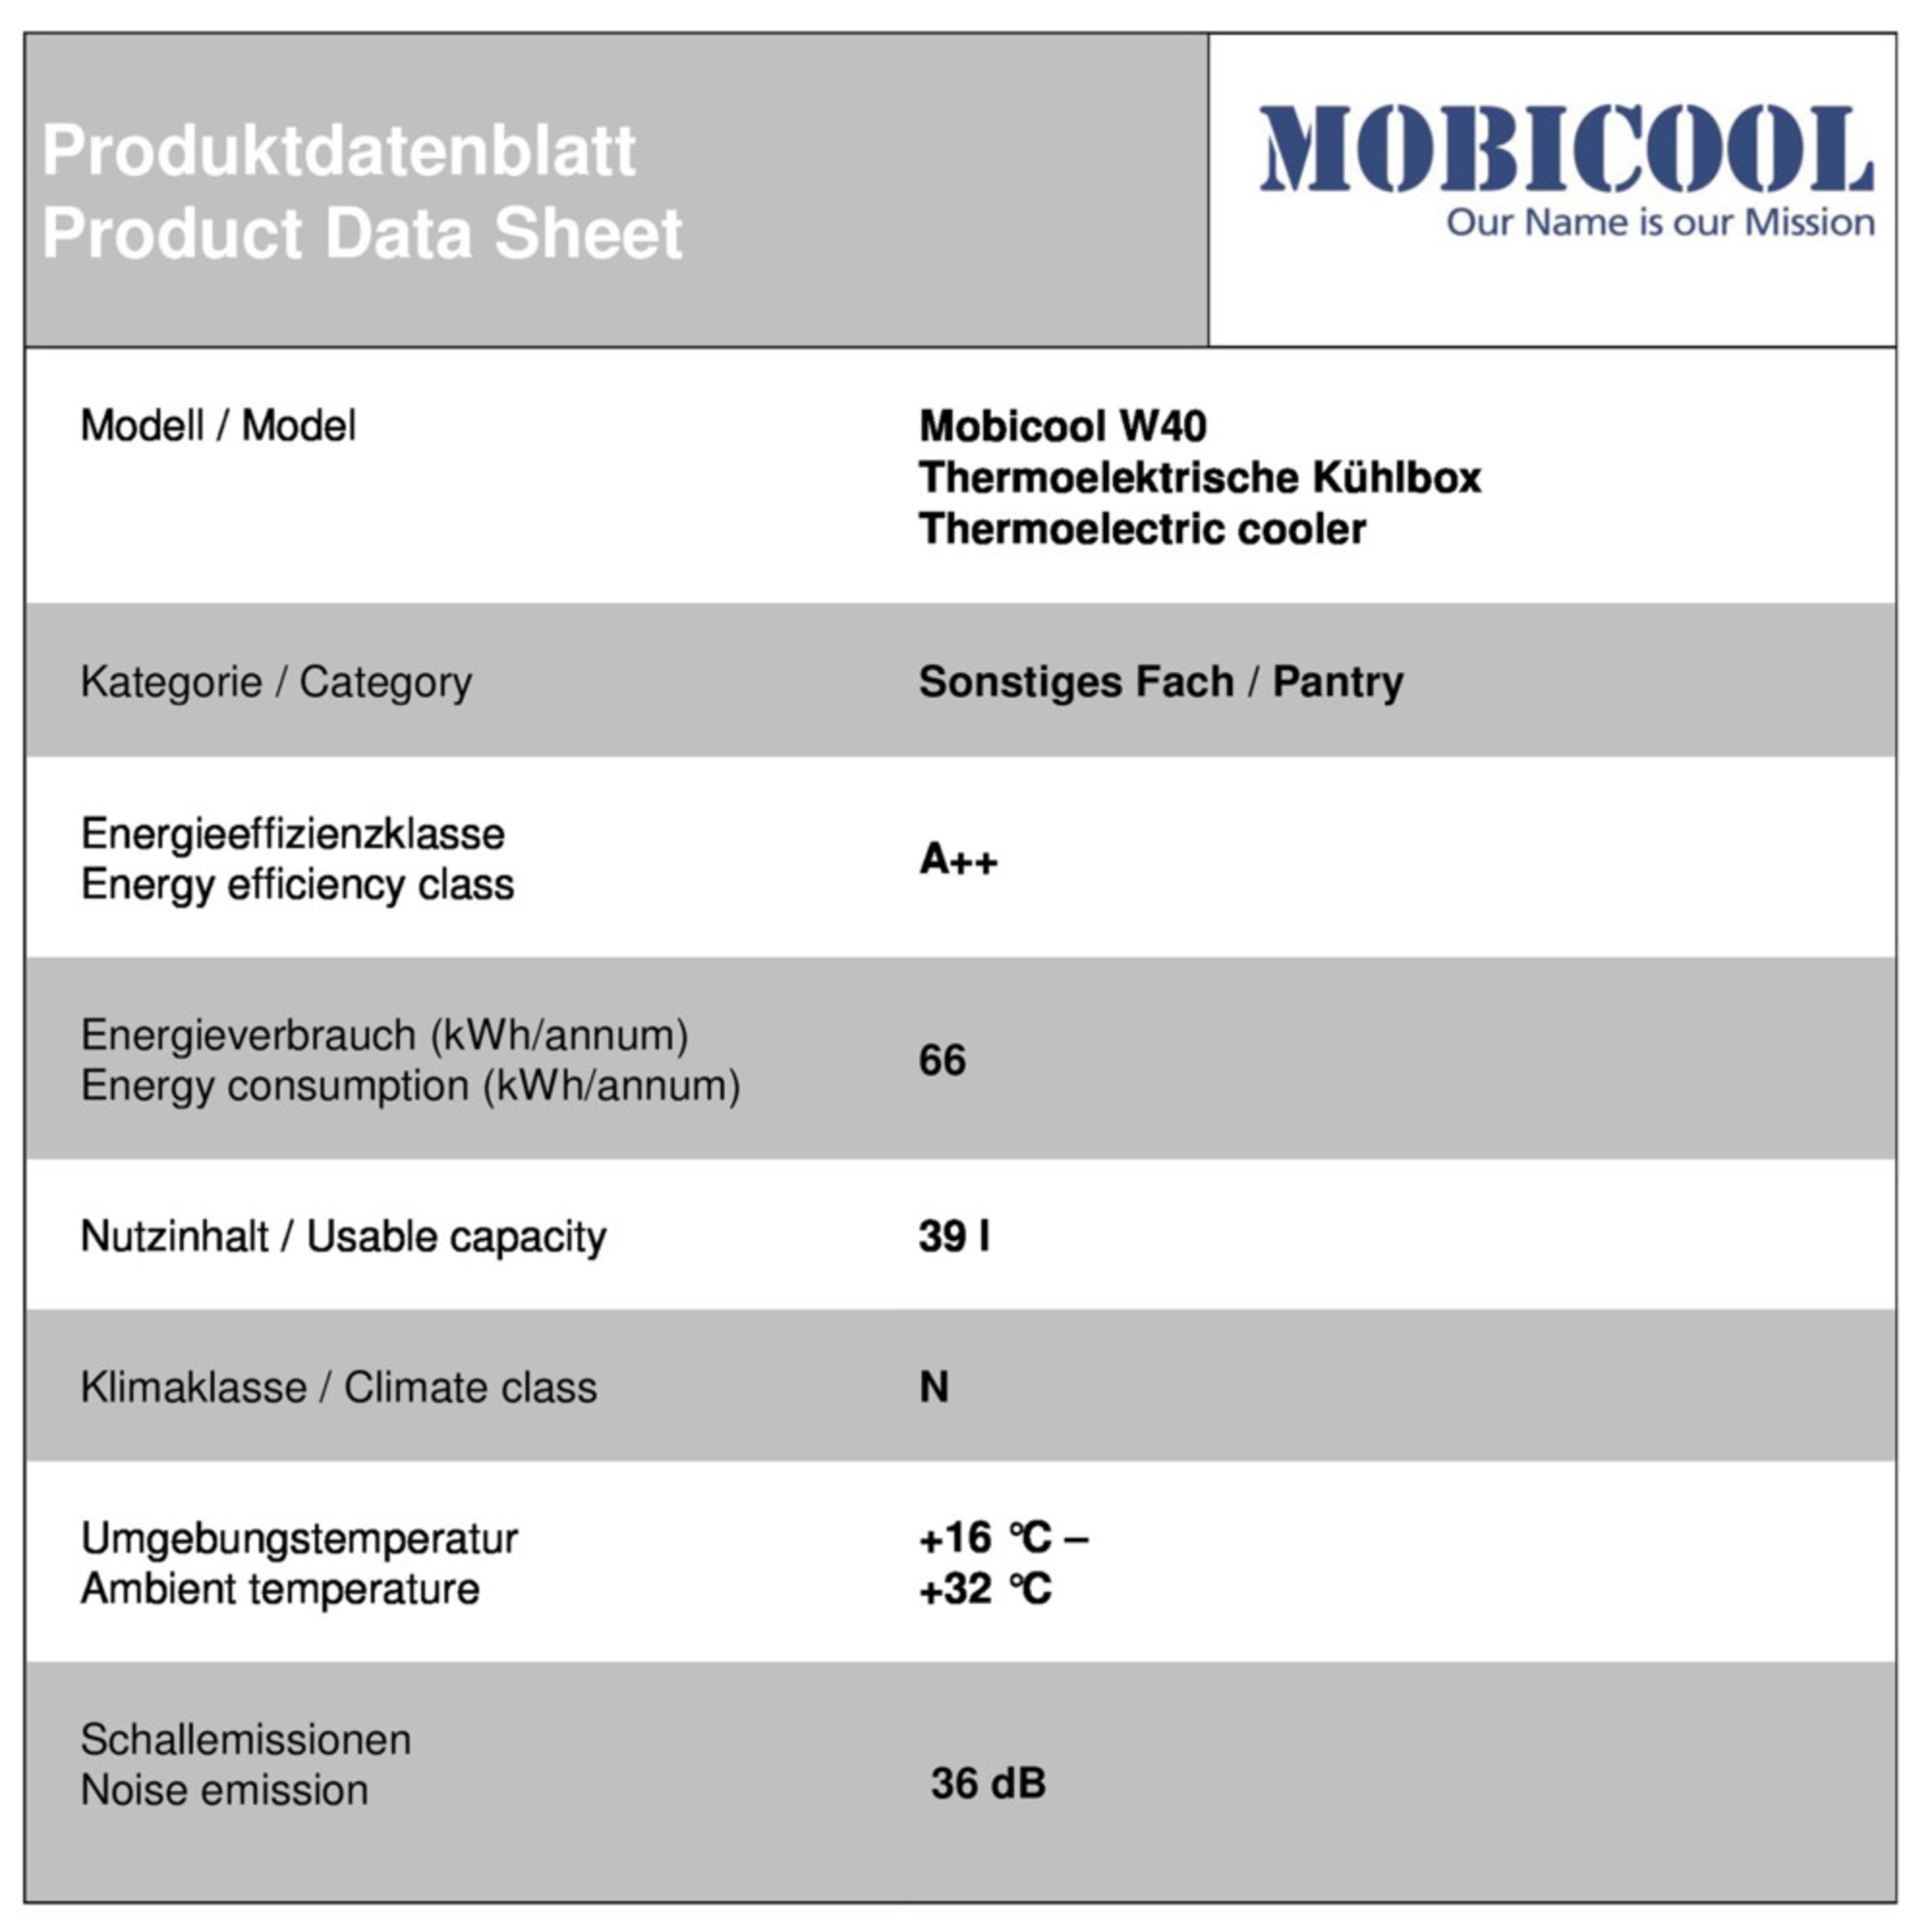 Mobicool W40 Energy data sheet